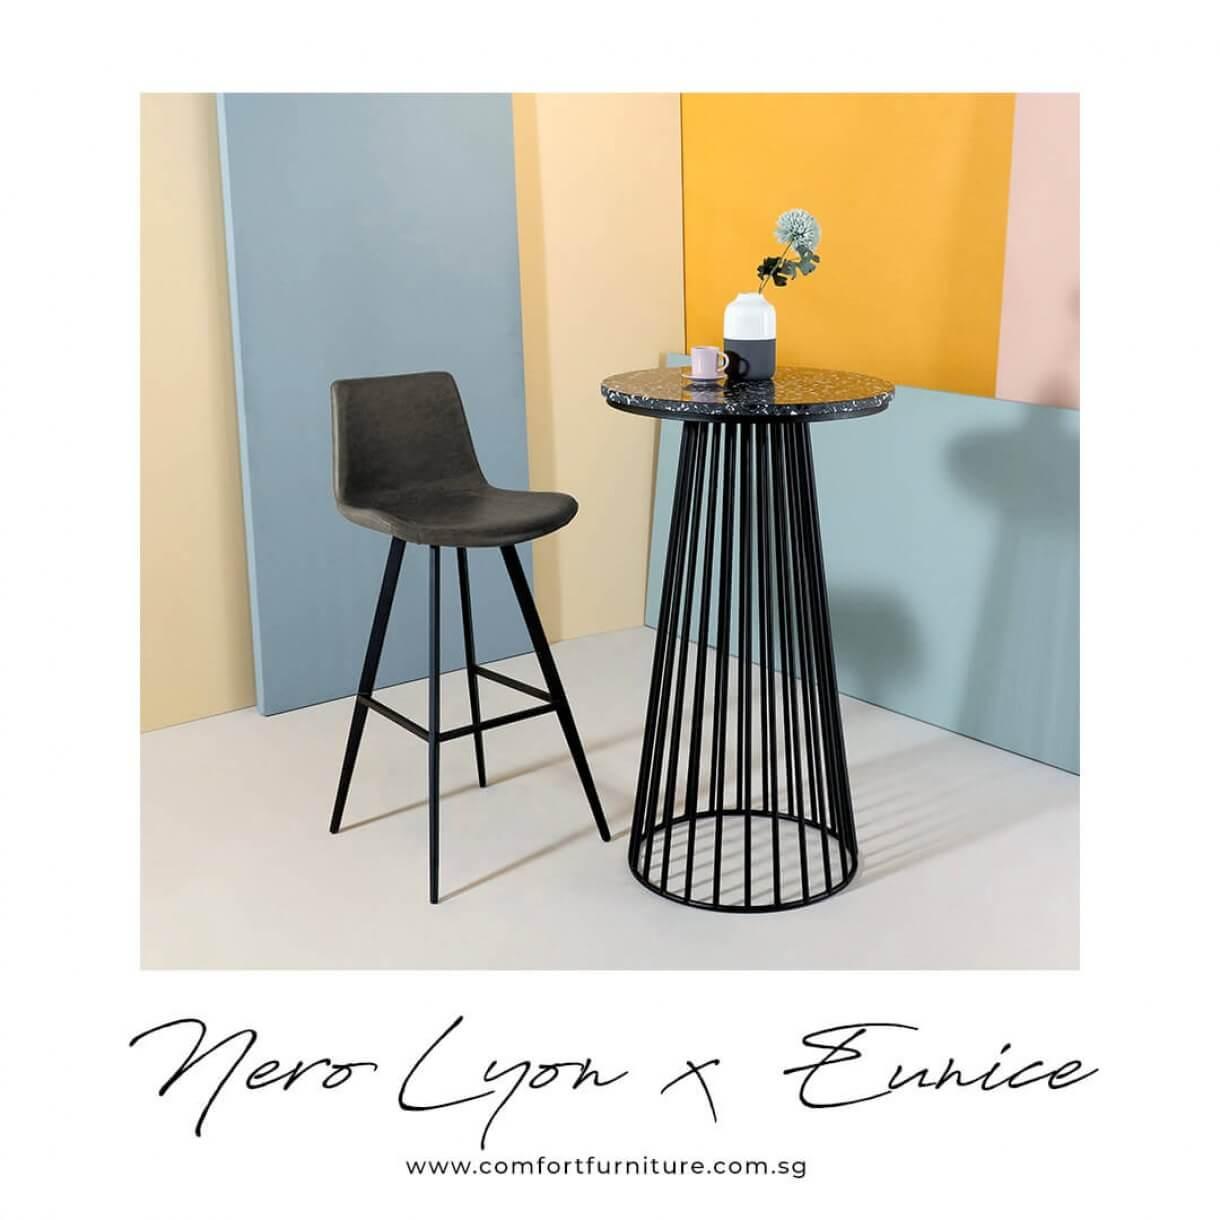 Modern Yet Minimalist Design Trend with Terrazzo Tables - Comfort Furniture